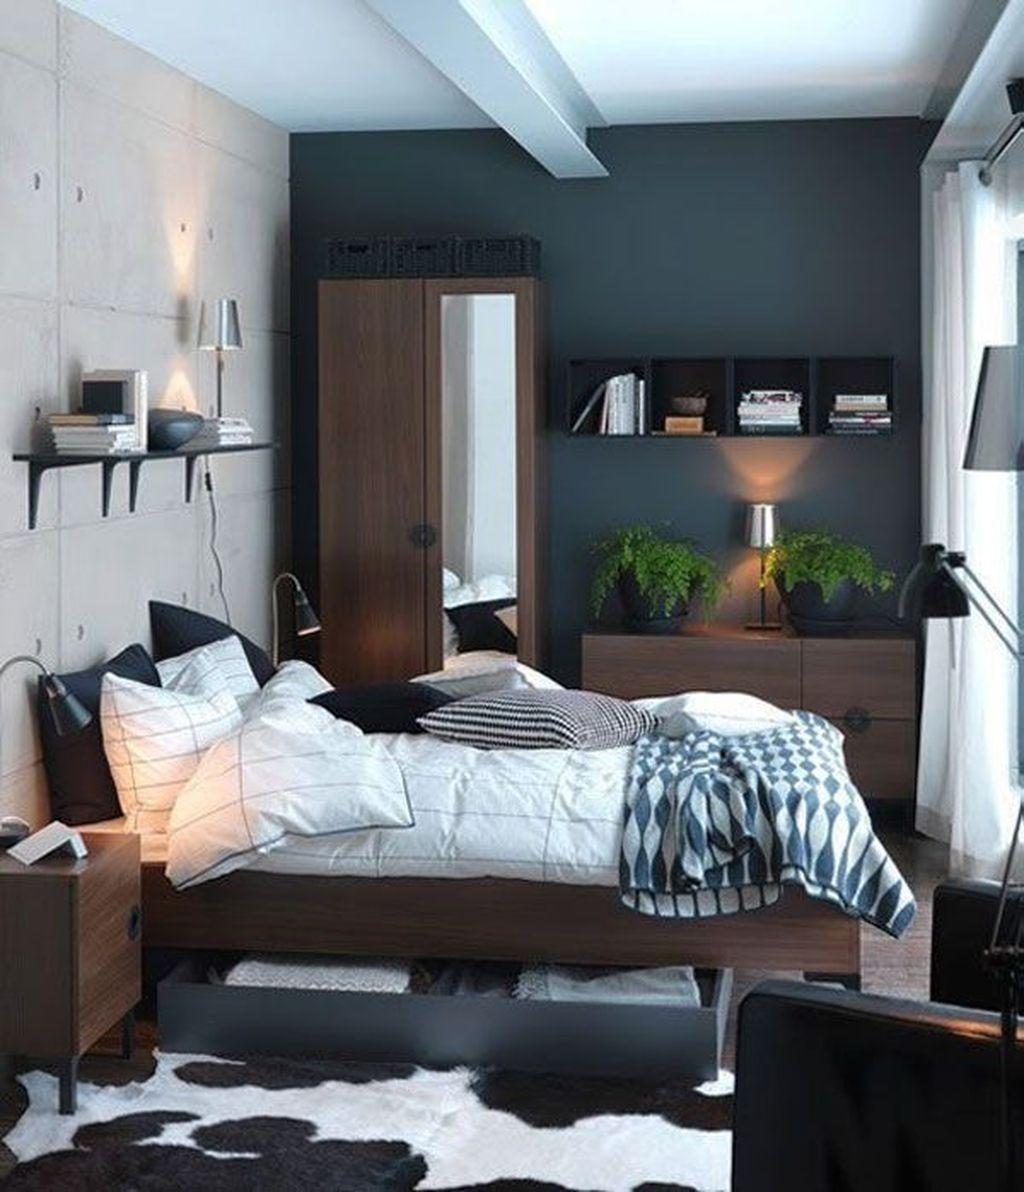 50 Luxury Modern Man Bedroom Design Ideas Luxurymensbedrooms Small Bedroom Interior Ikea Bedroom Design Small Space Bedroom